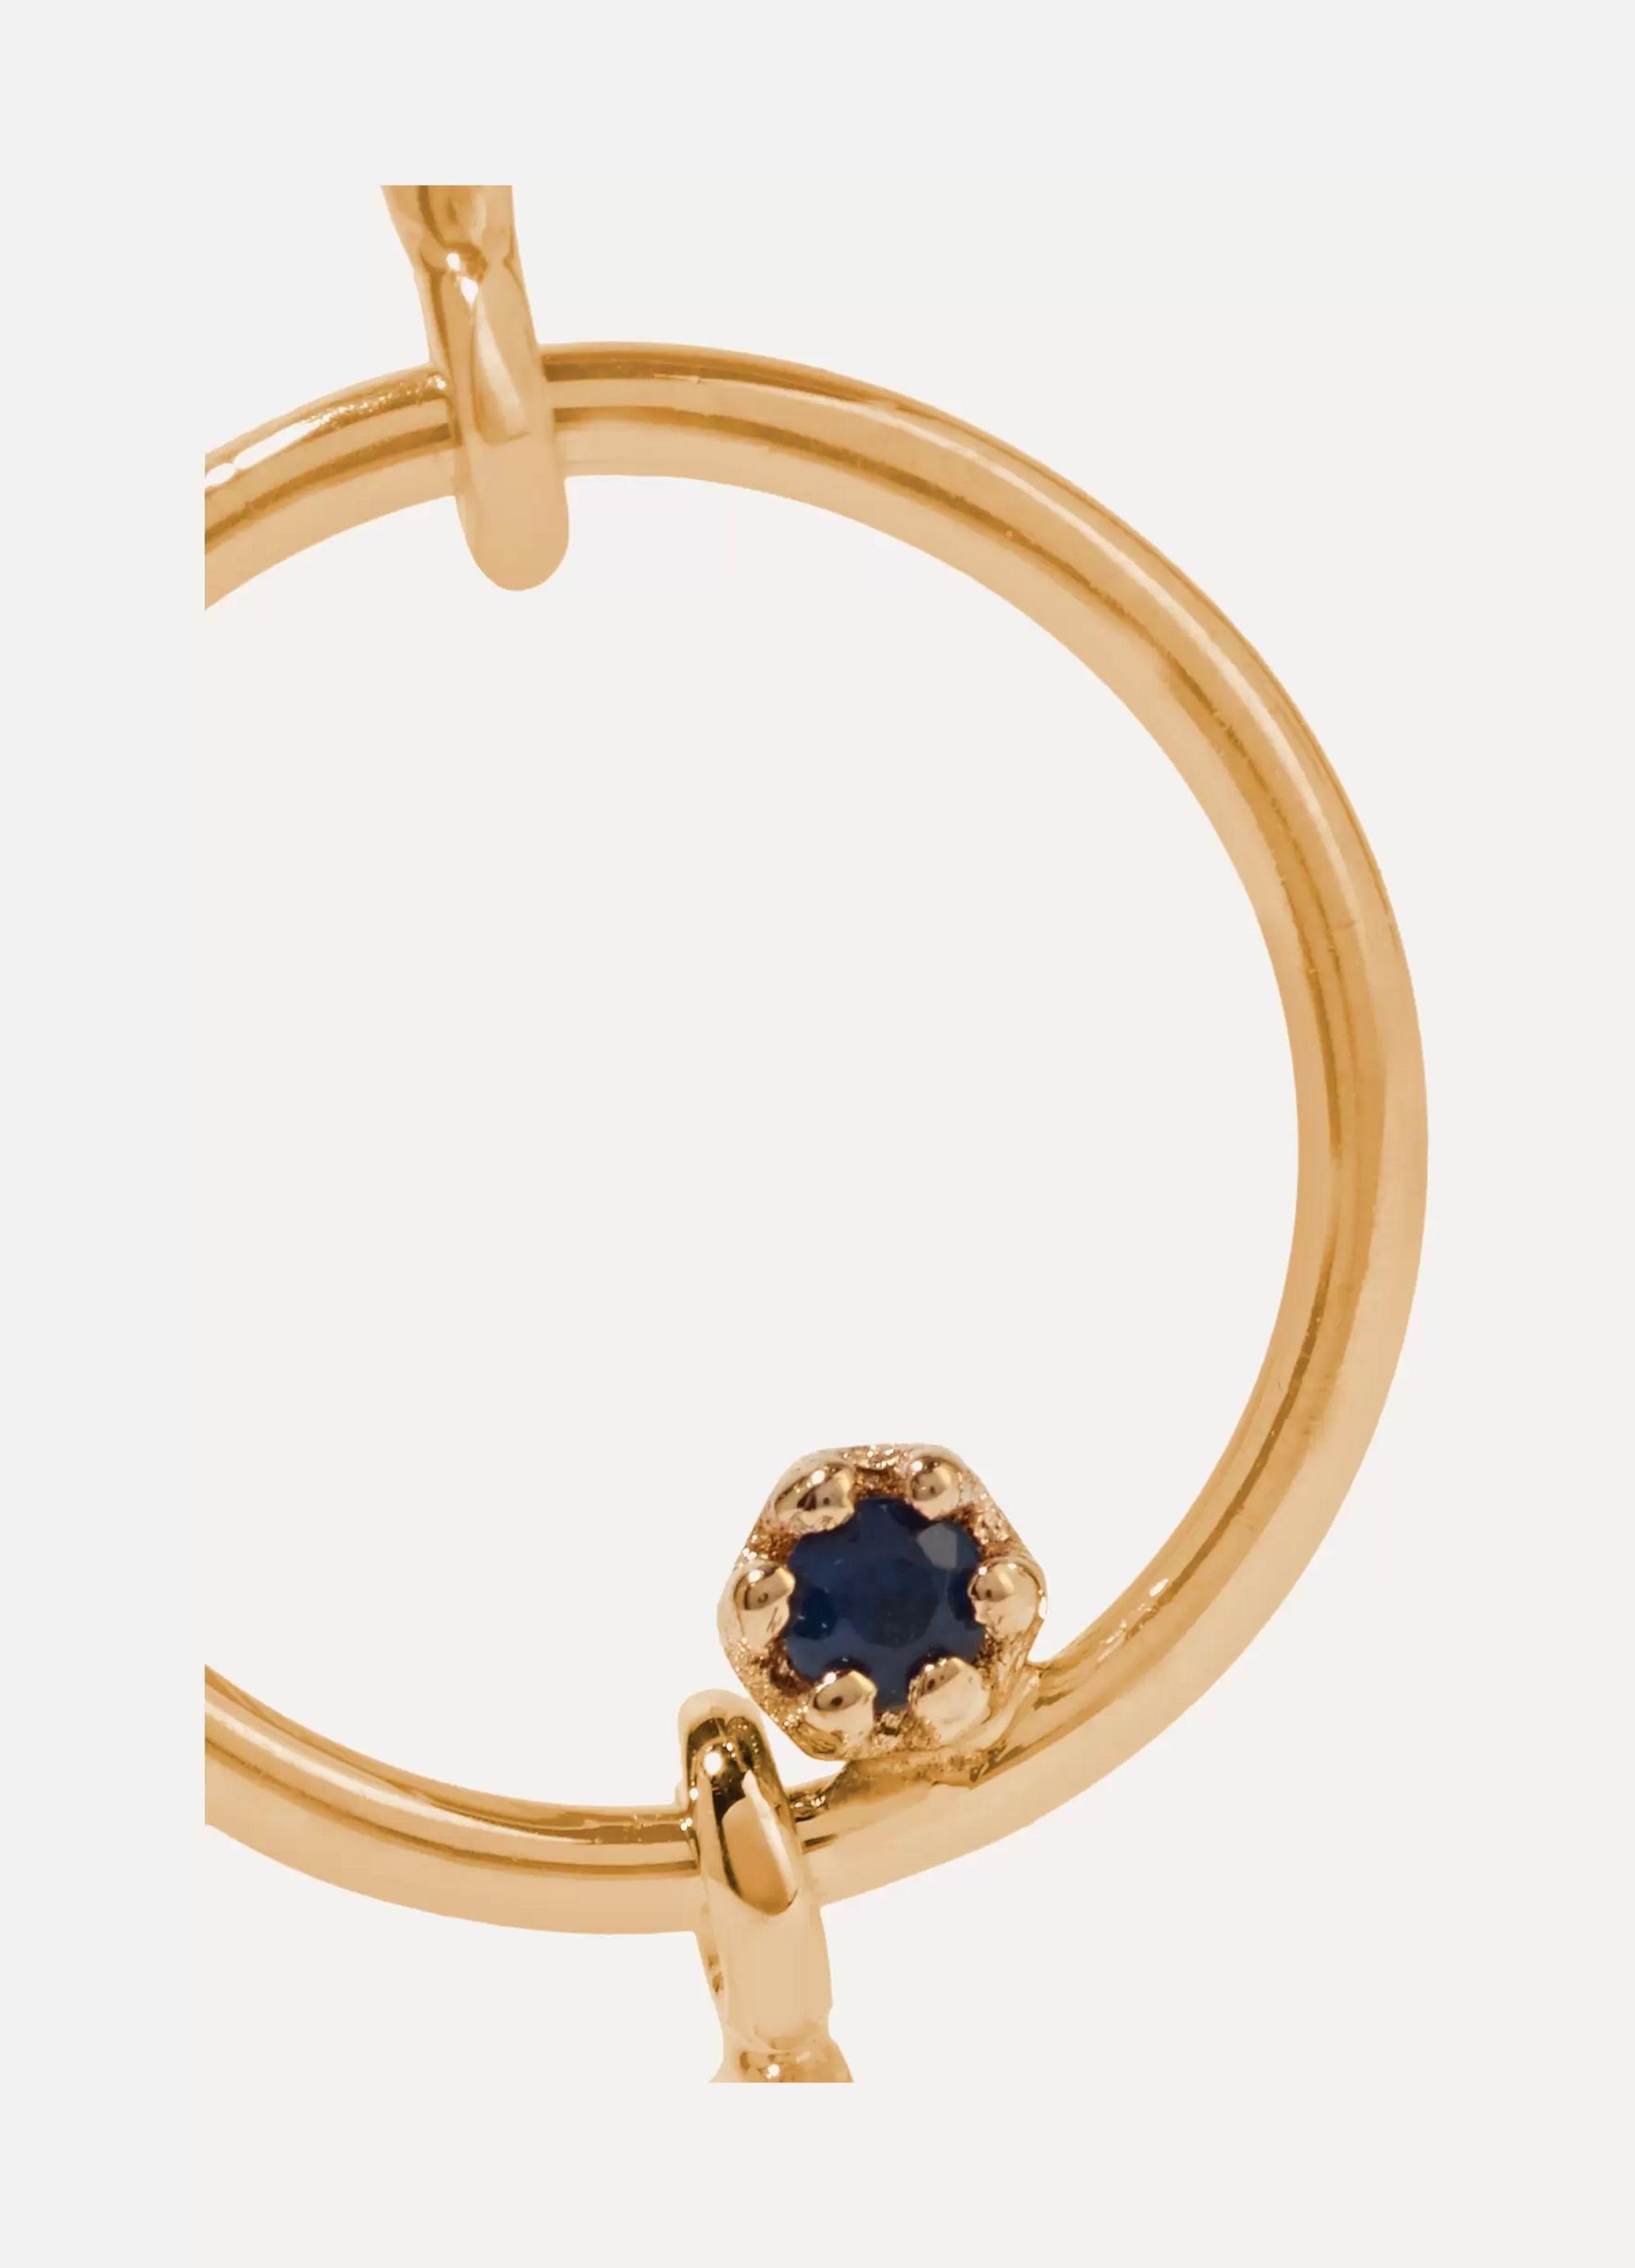 SARAH & SEBASTIAN Long Bubble Ohrring aus 14 Karat Gold mit Saphir